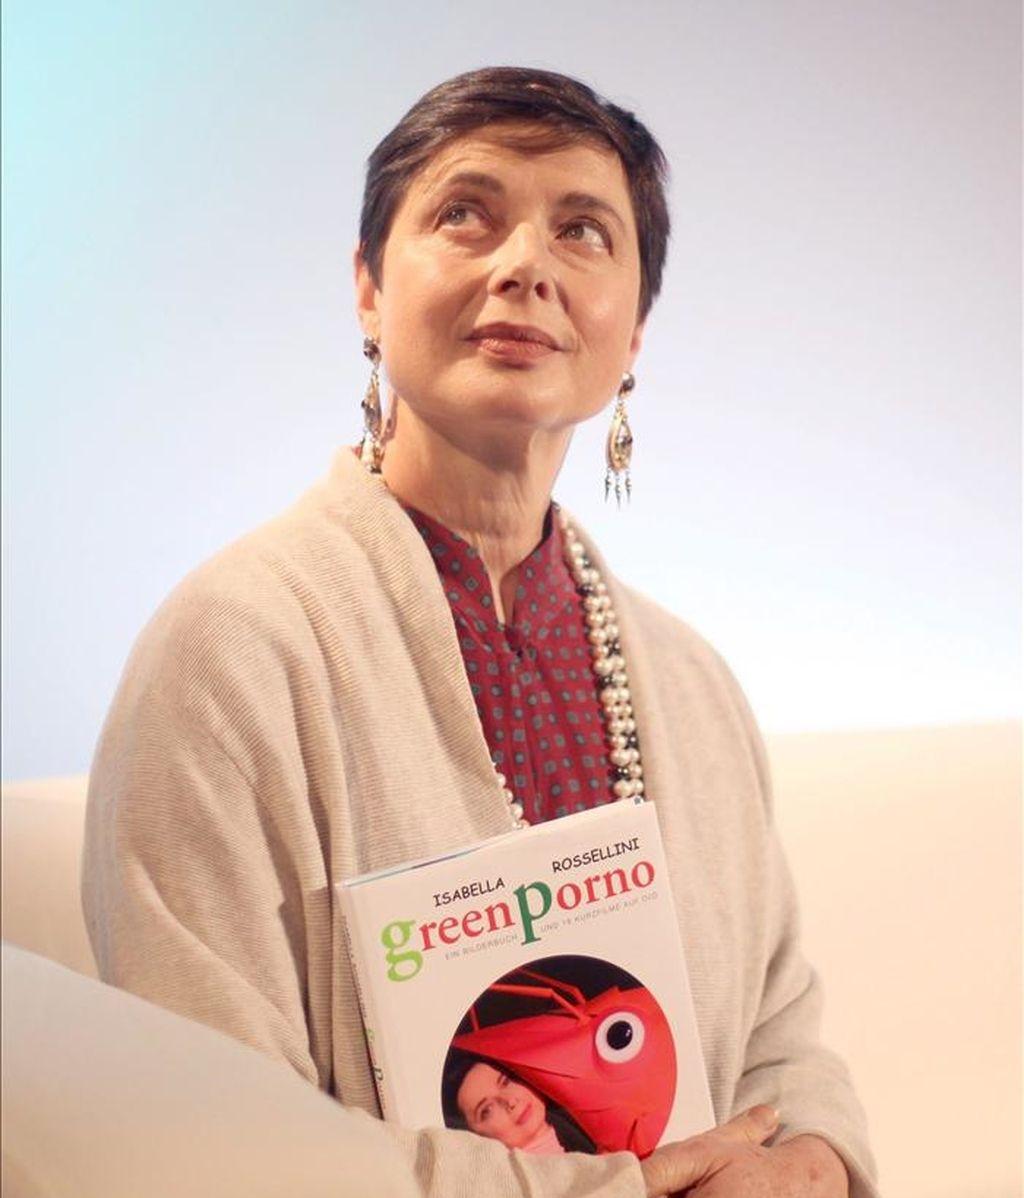 La actriz italiana Isabella Rossellini. EFE/Archivo